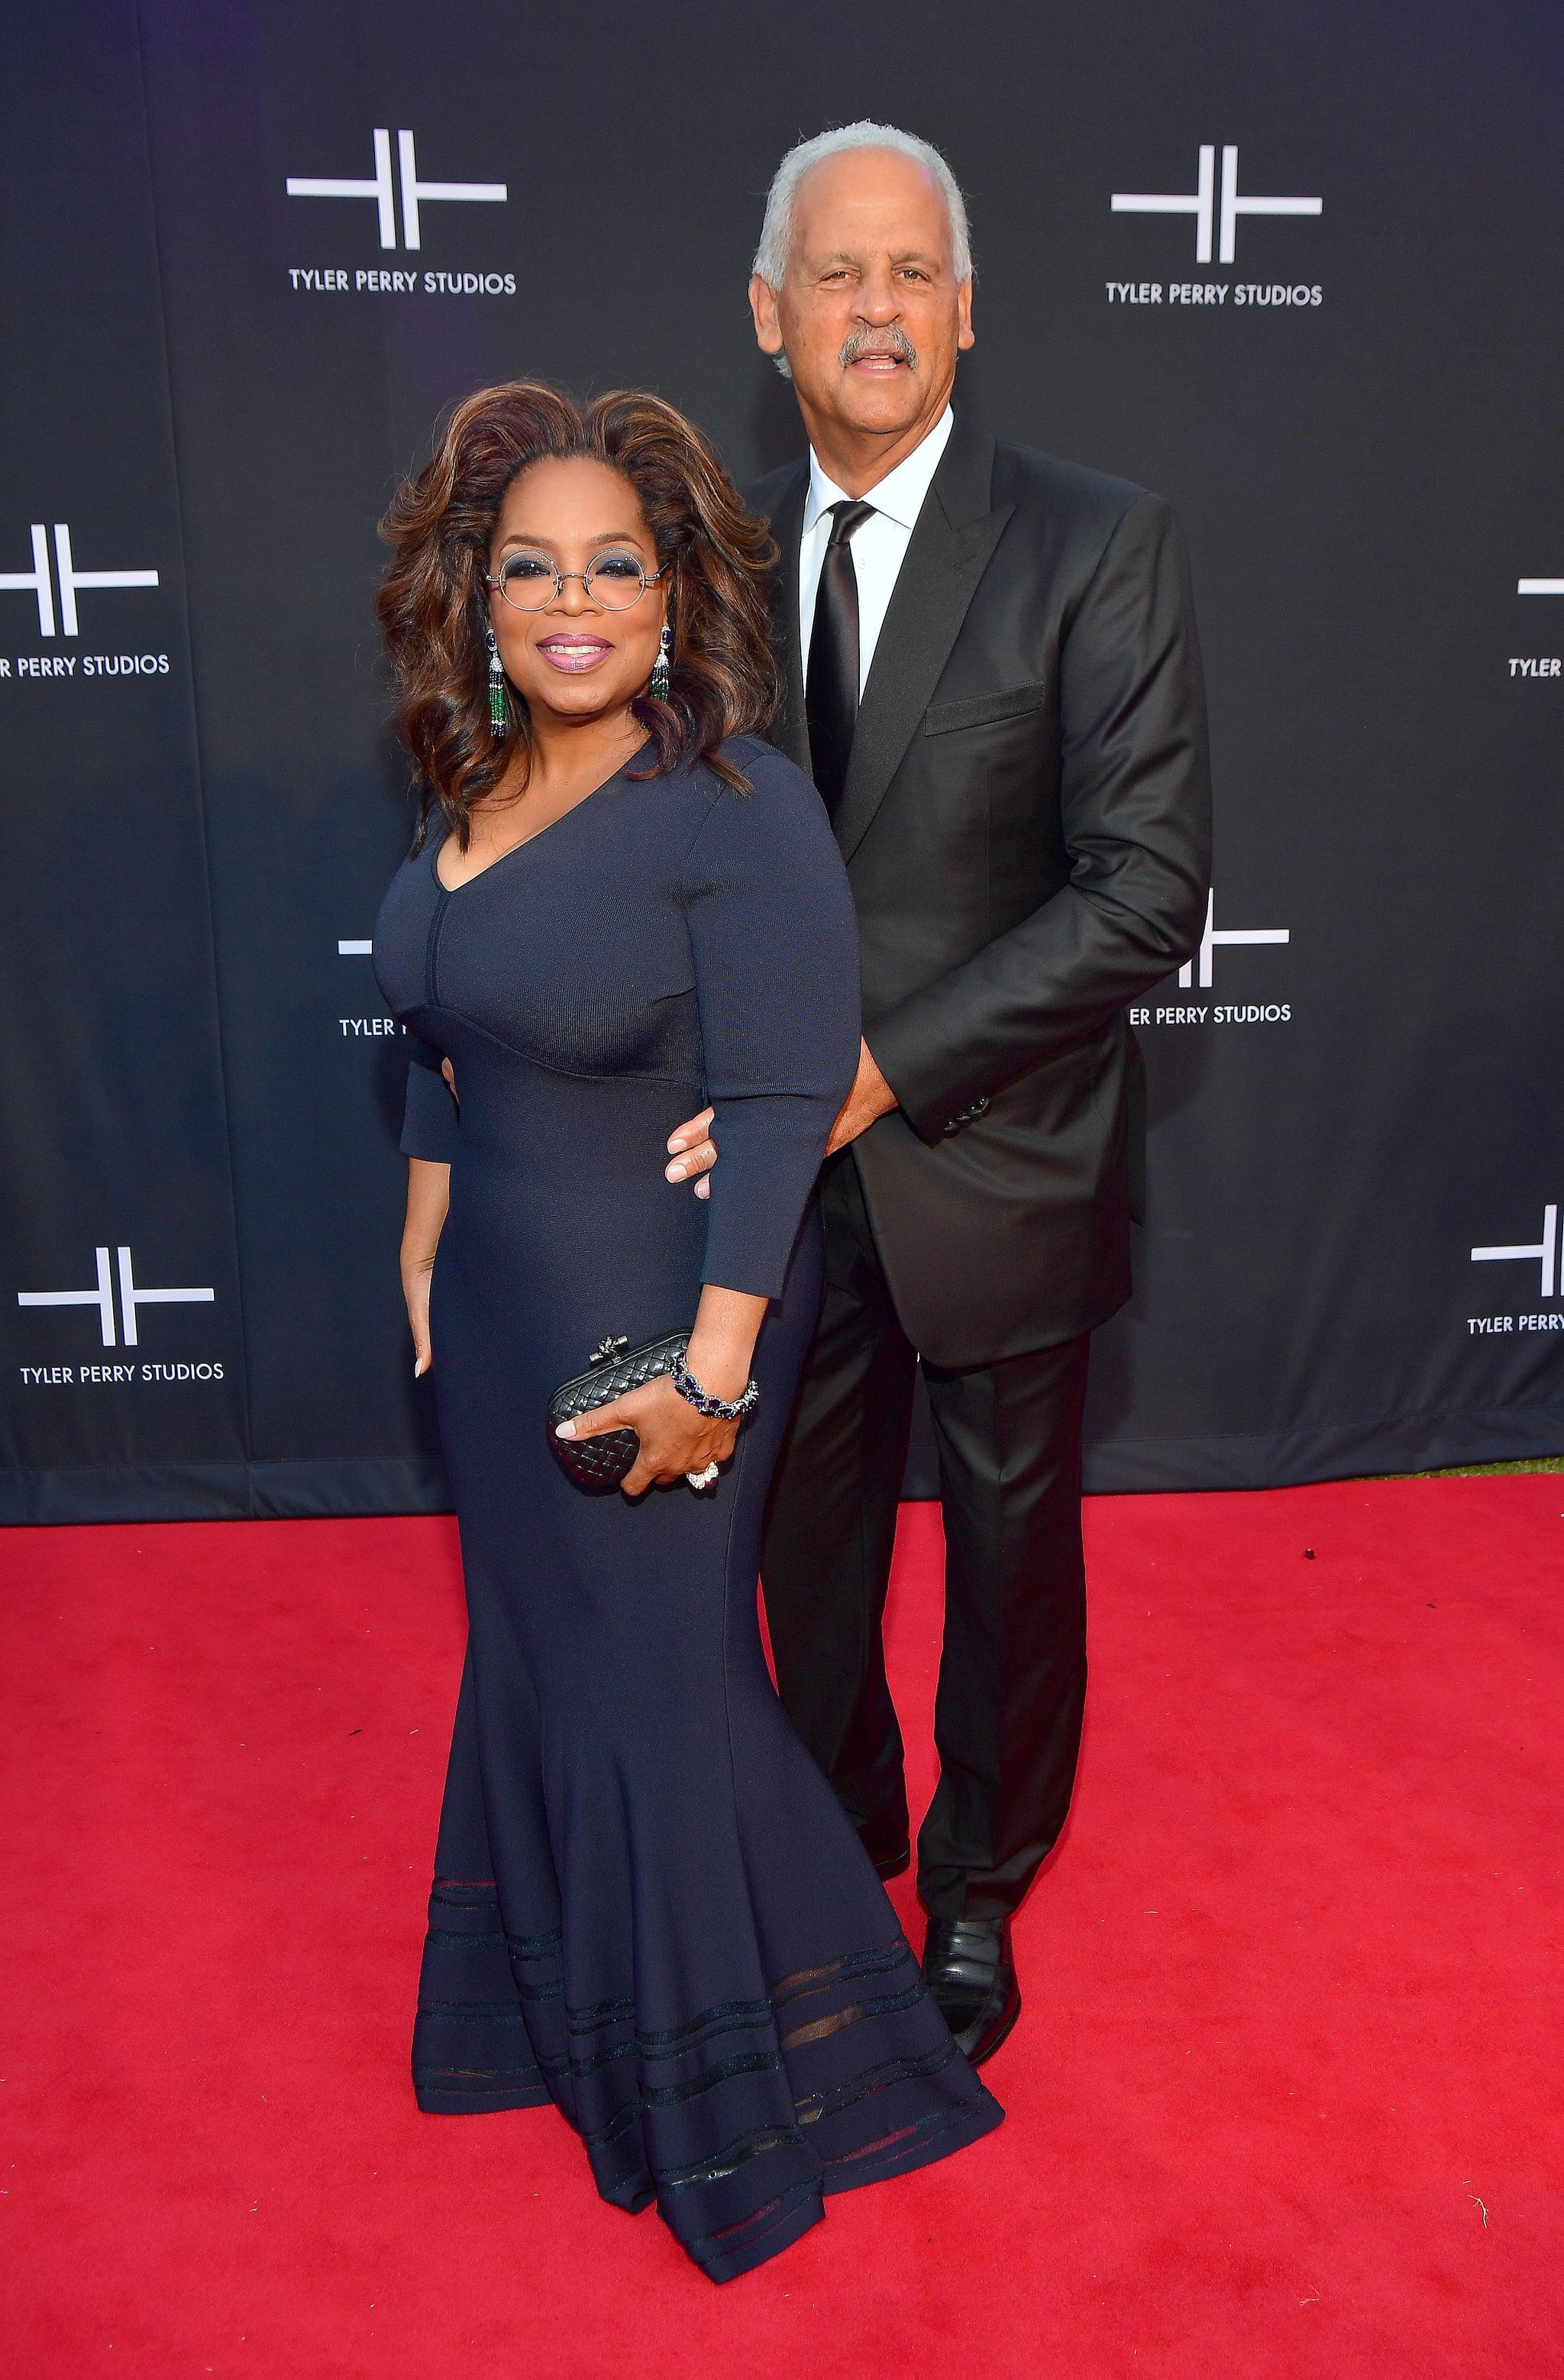 ATLANTA, GA - OCTOBER 05: Oprah Winfrey and Stedman Graham attend Tyler Perry Studios Grand Opening Gala - Arrivals at Tyler Perry Studios on October 5, 2019 in Atlanta, Georgia.(Photo by Prince Williams/Wireimage)